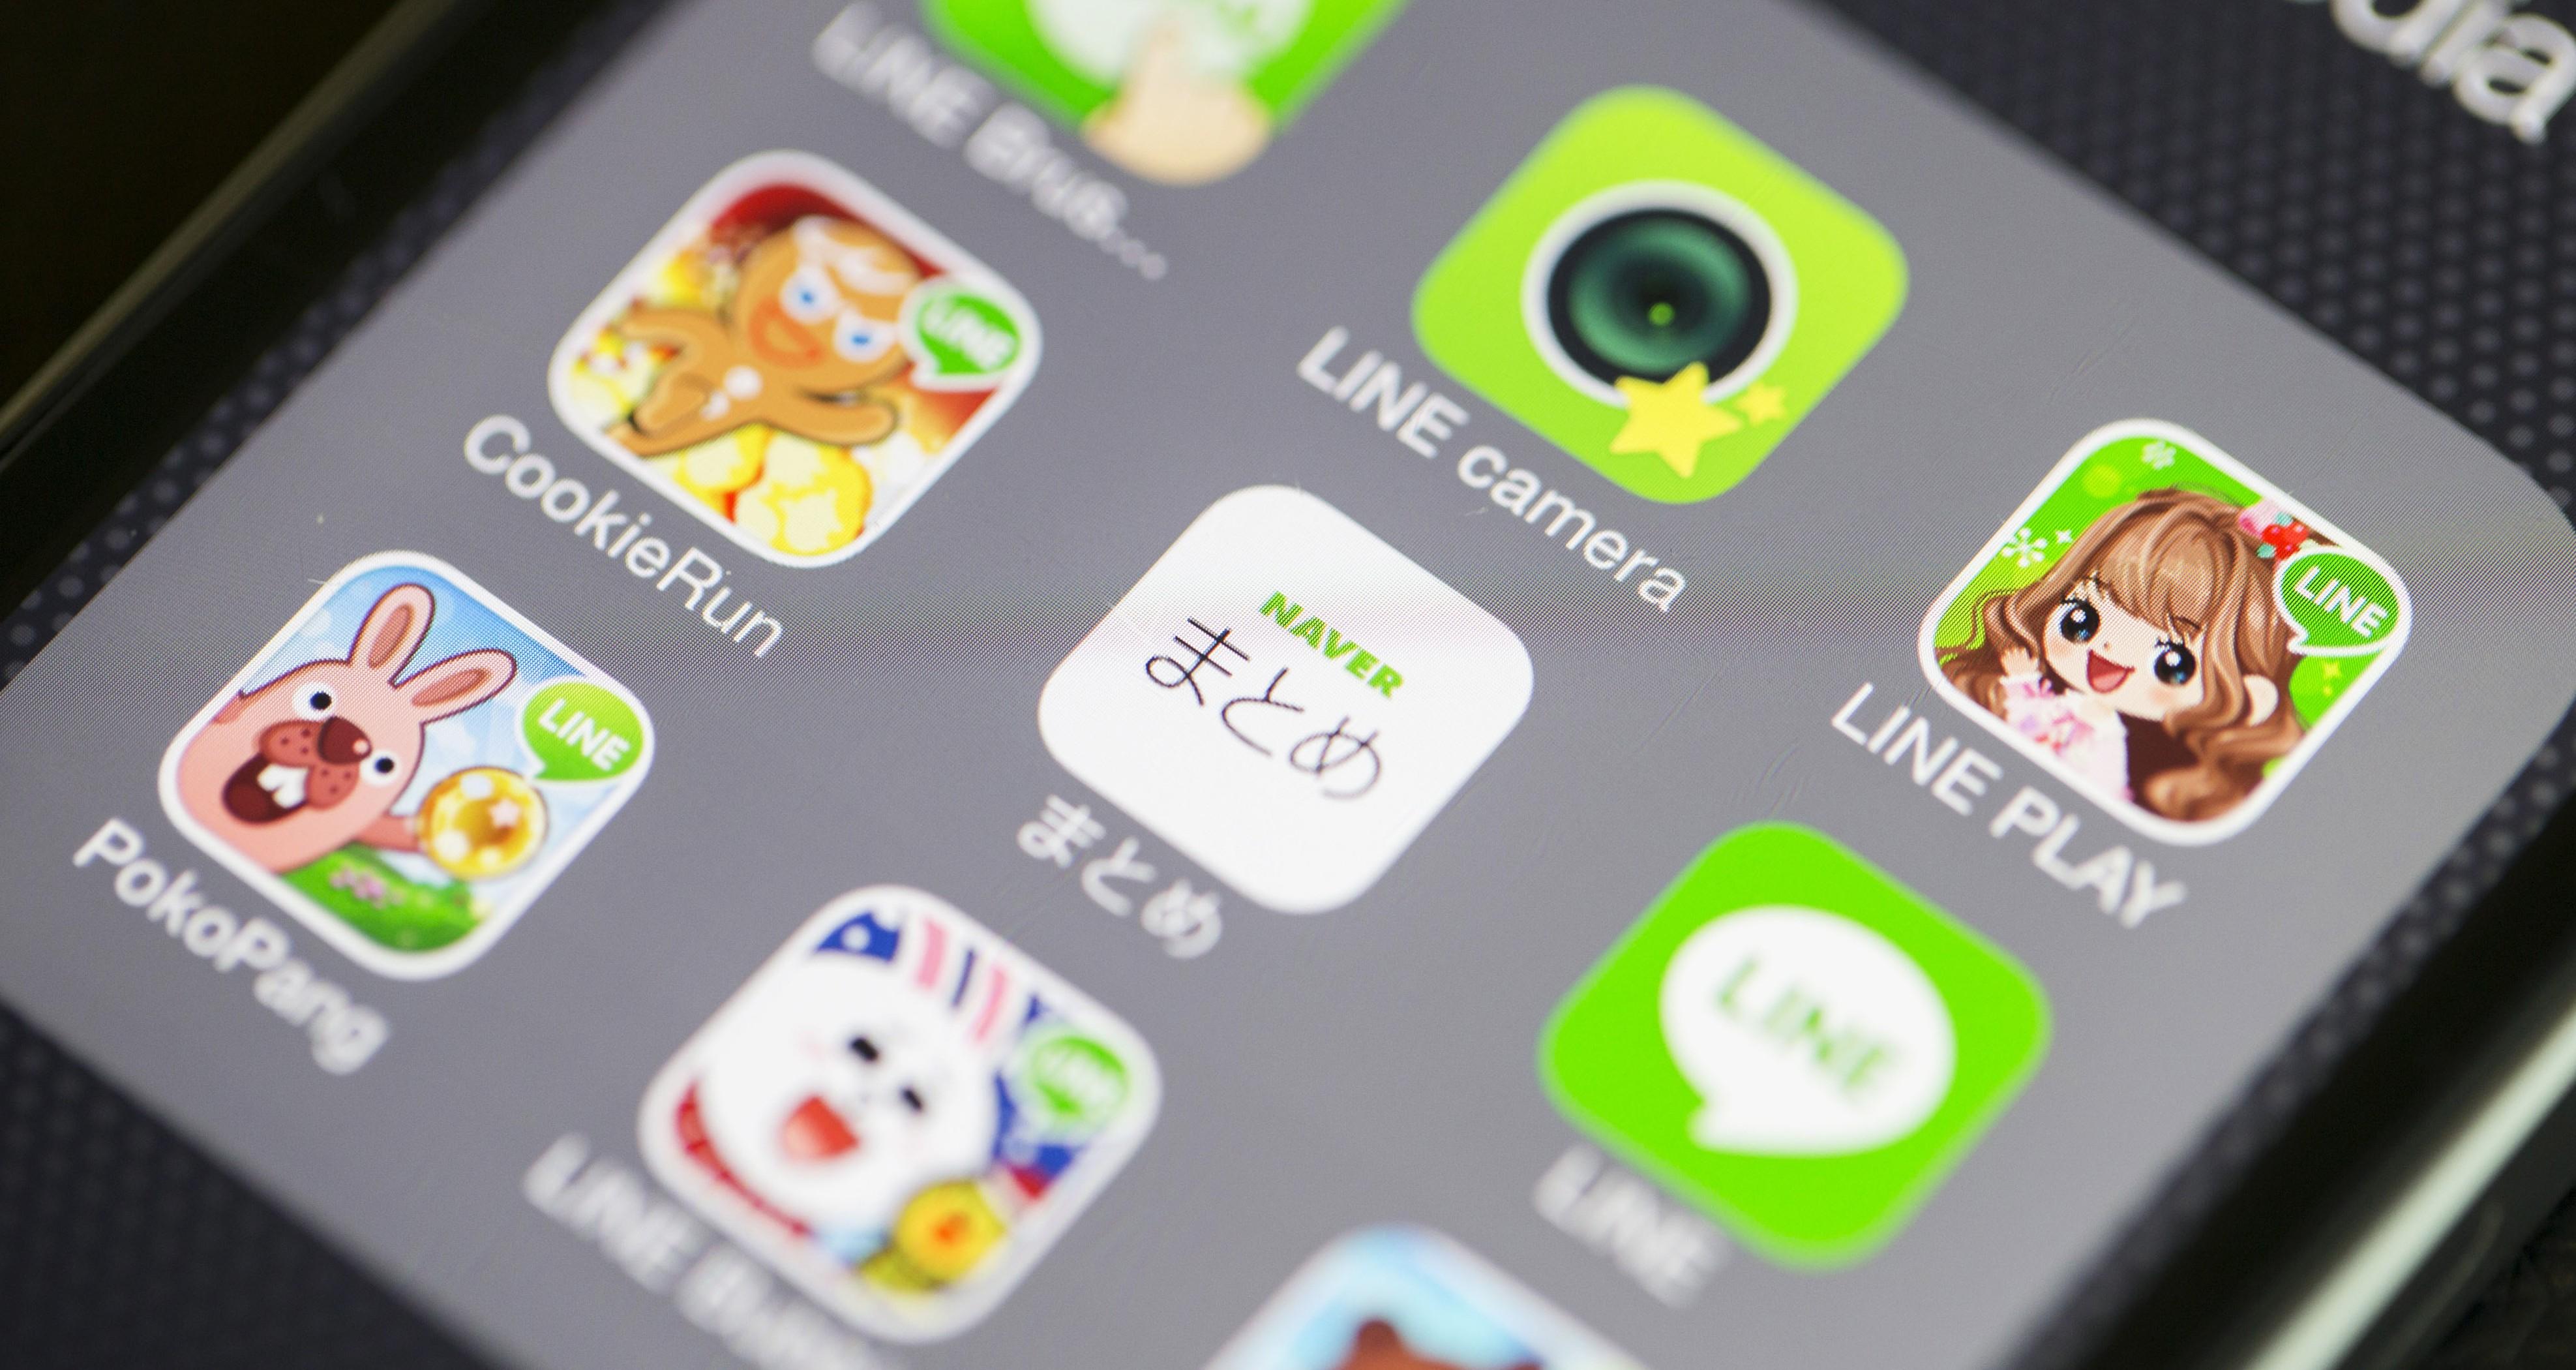 Naver Corp.'s Line Mobile Apps As SoftBank Said to Seek Stake